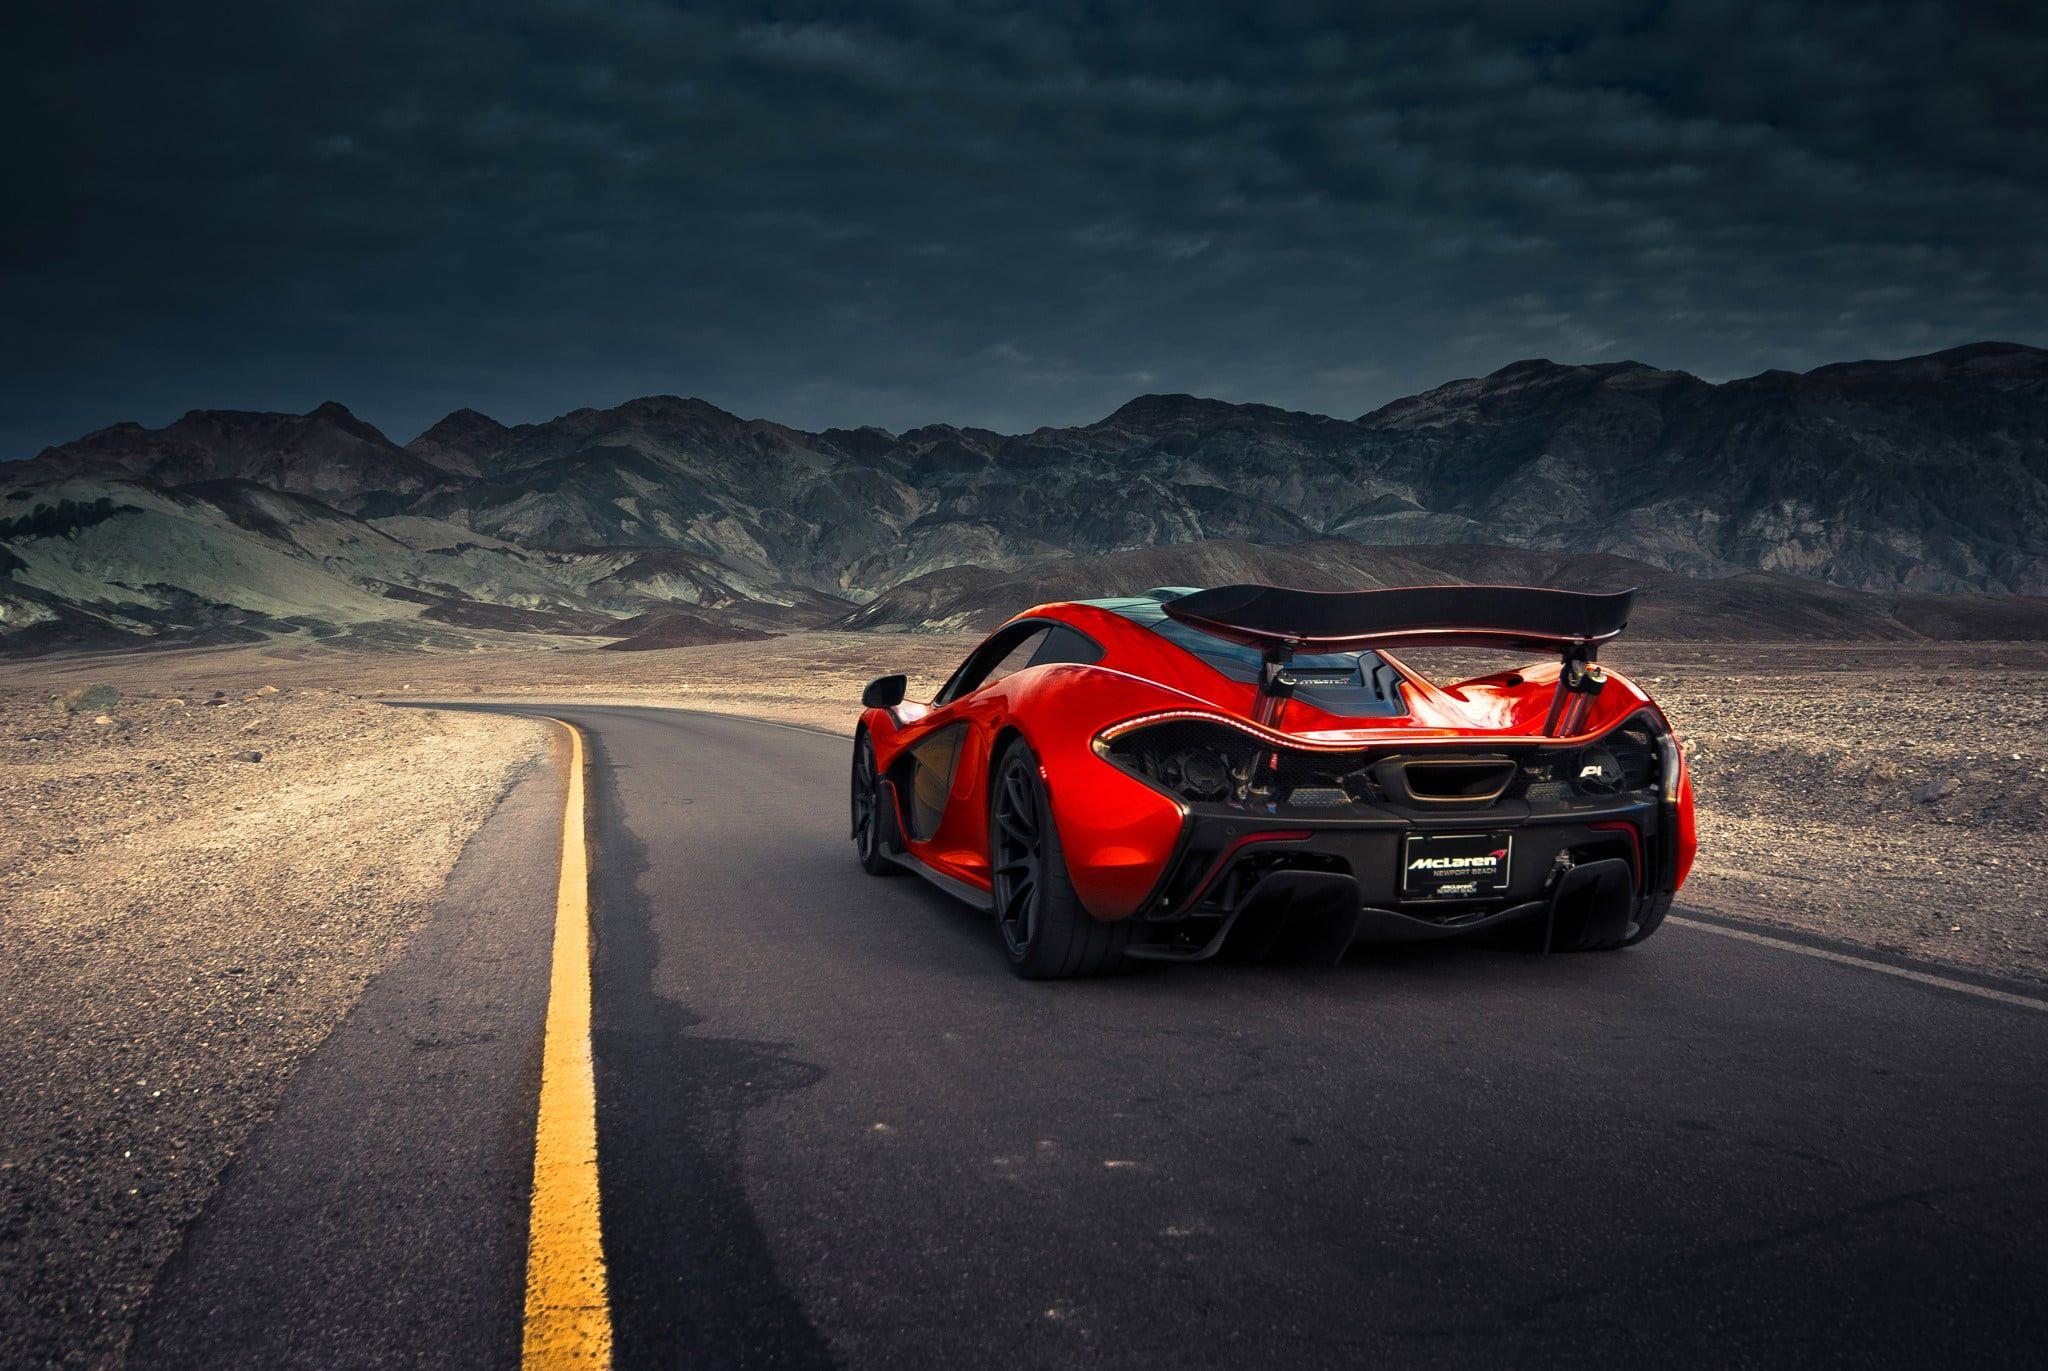 Red And Black Luxury Car Mclaren Car Mclaren P1 1080p Wallpaper Hdwallpaper Desktop Luxury Cars Mclaren Cars Car Wallpapers